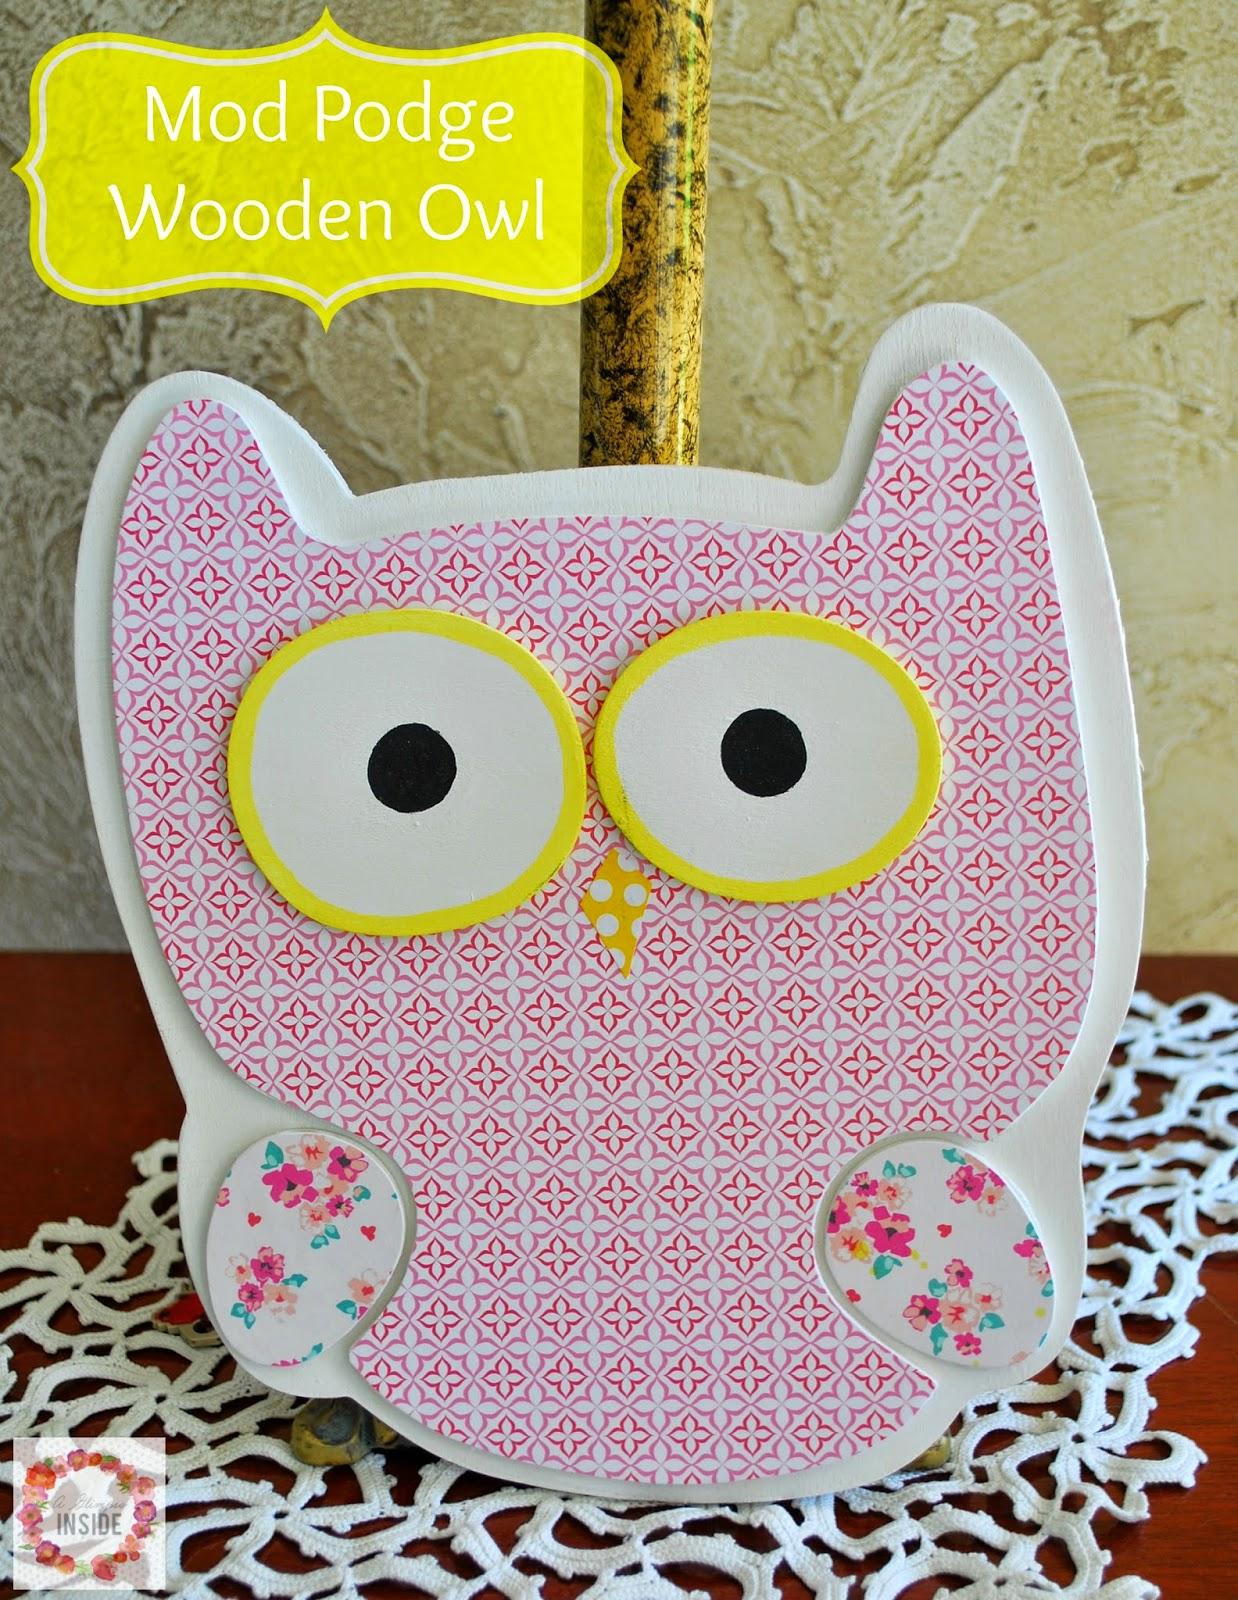 http://www.aglimpseinsideblog.com/2014/12/mod-podge-wooden-owl.html